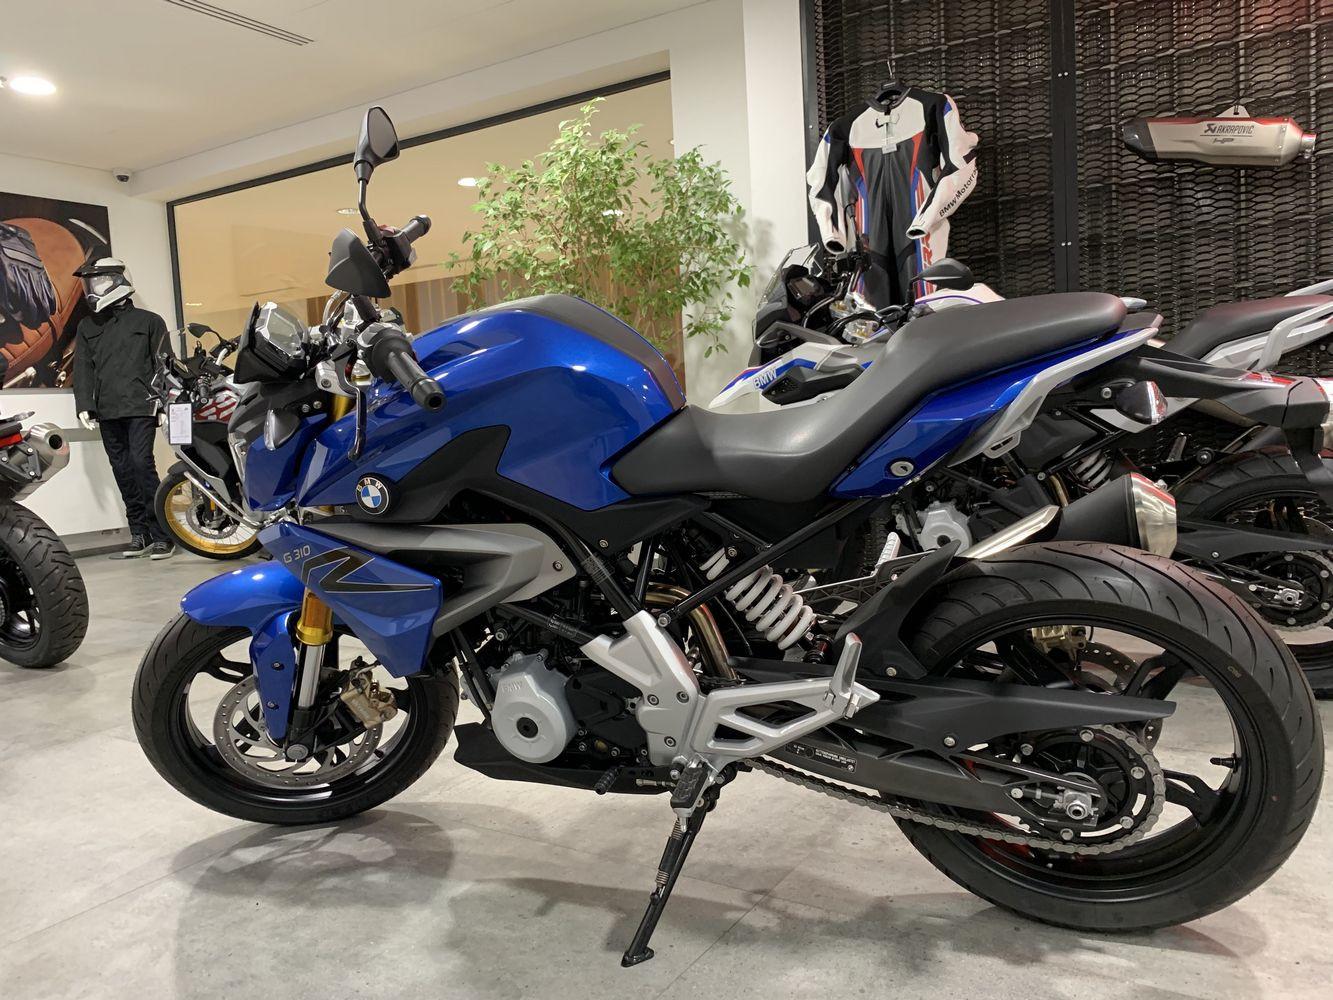 G 310 R STRATO BLUE METALLIC